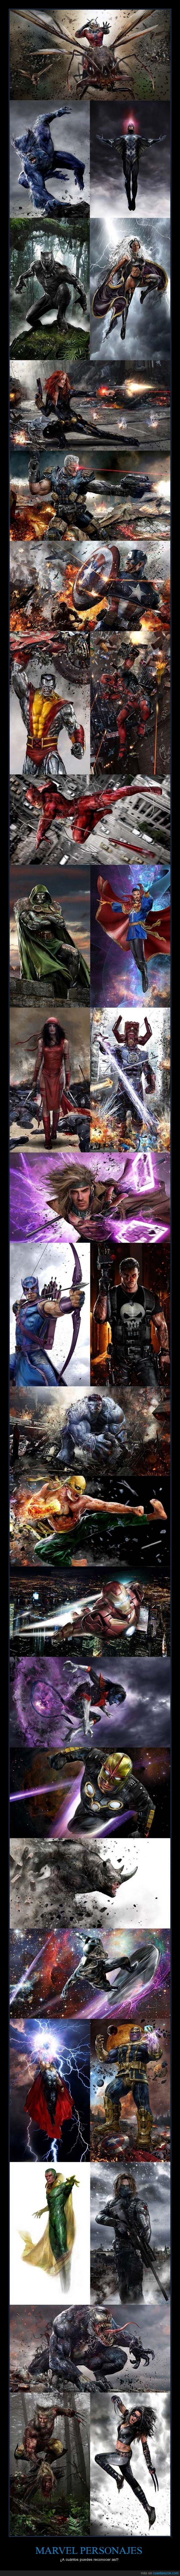 heroes,ilustracion,marvel,personajes,spiderman,xman,xmen